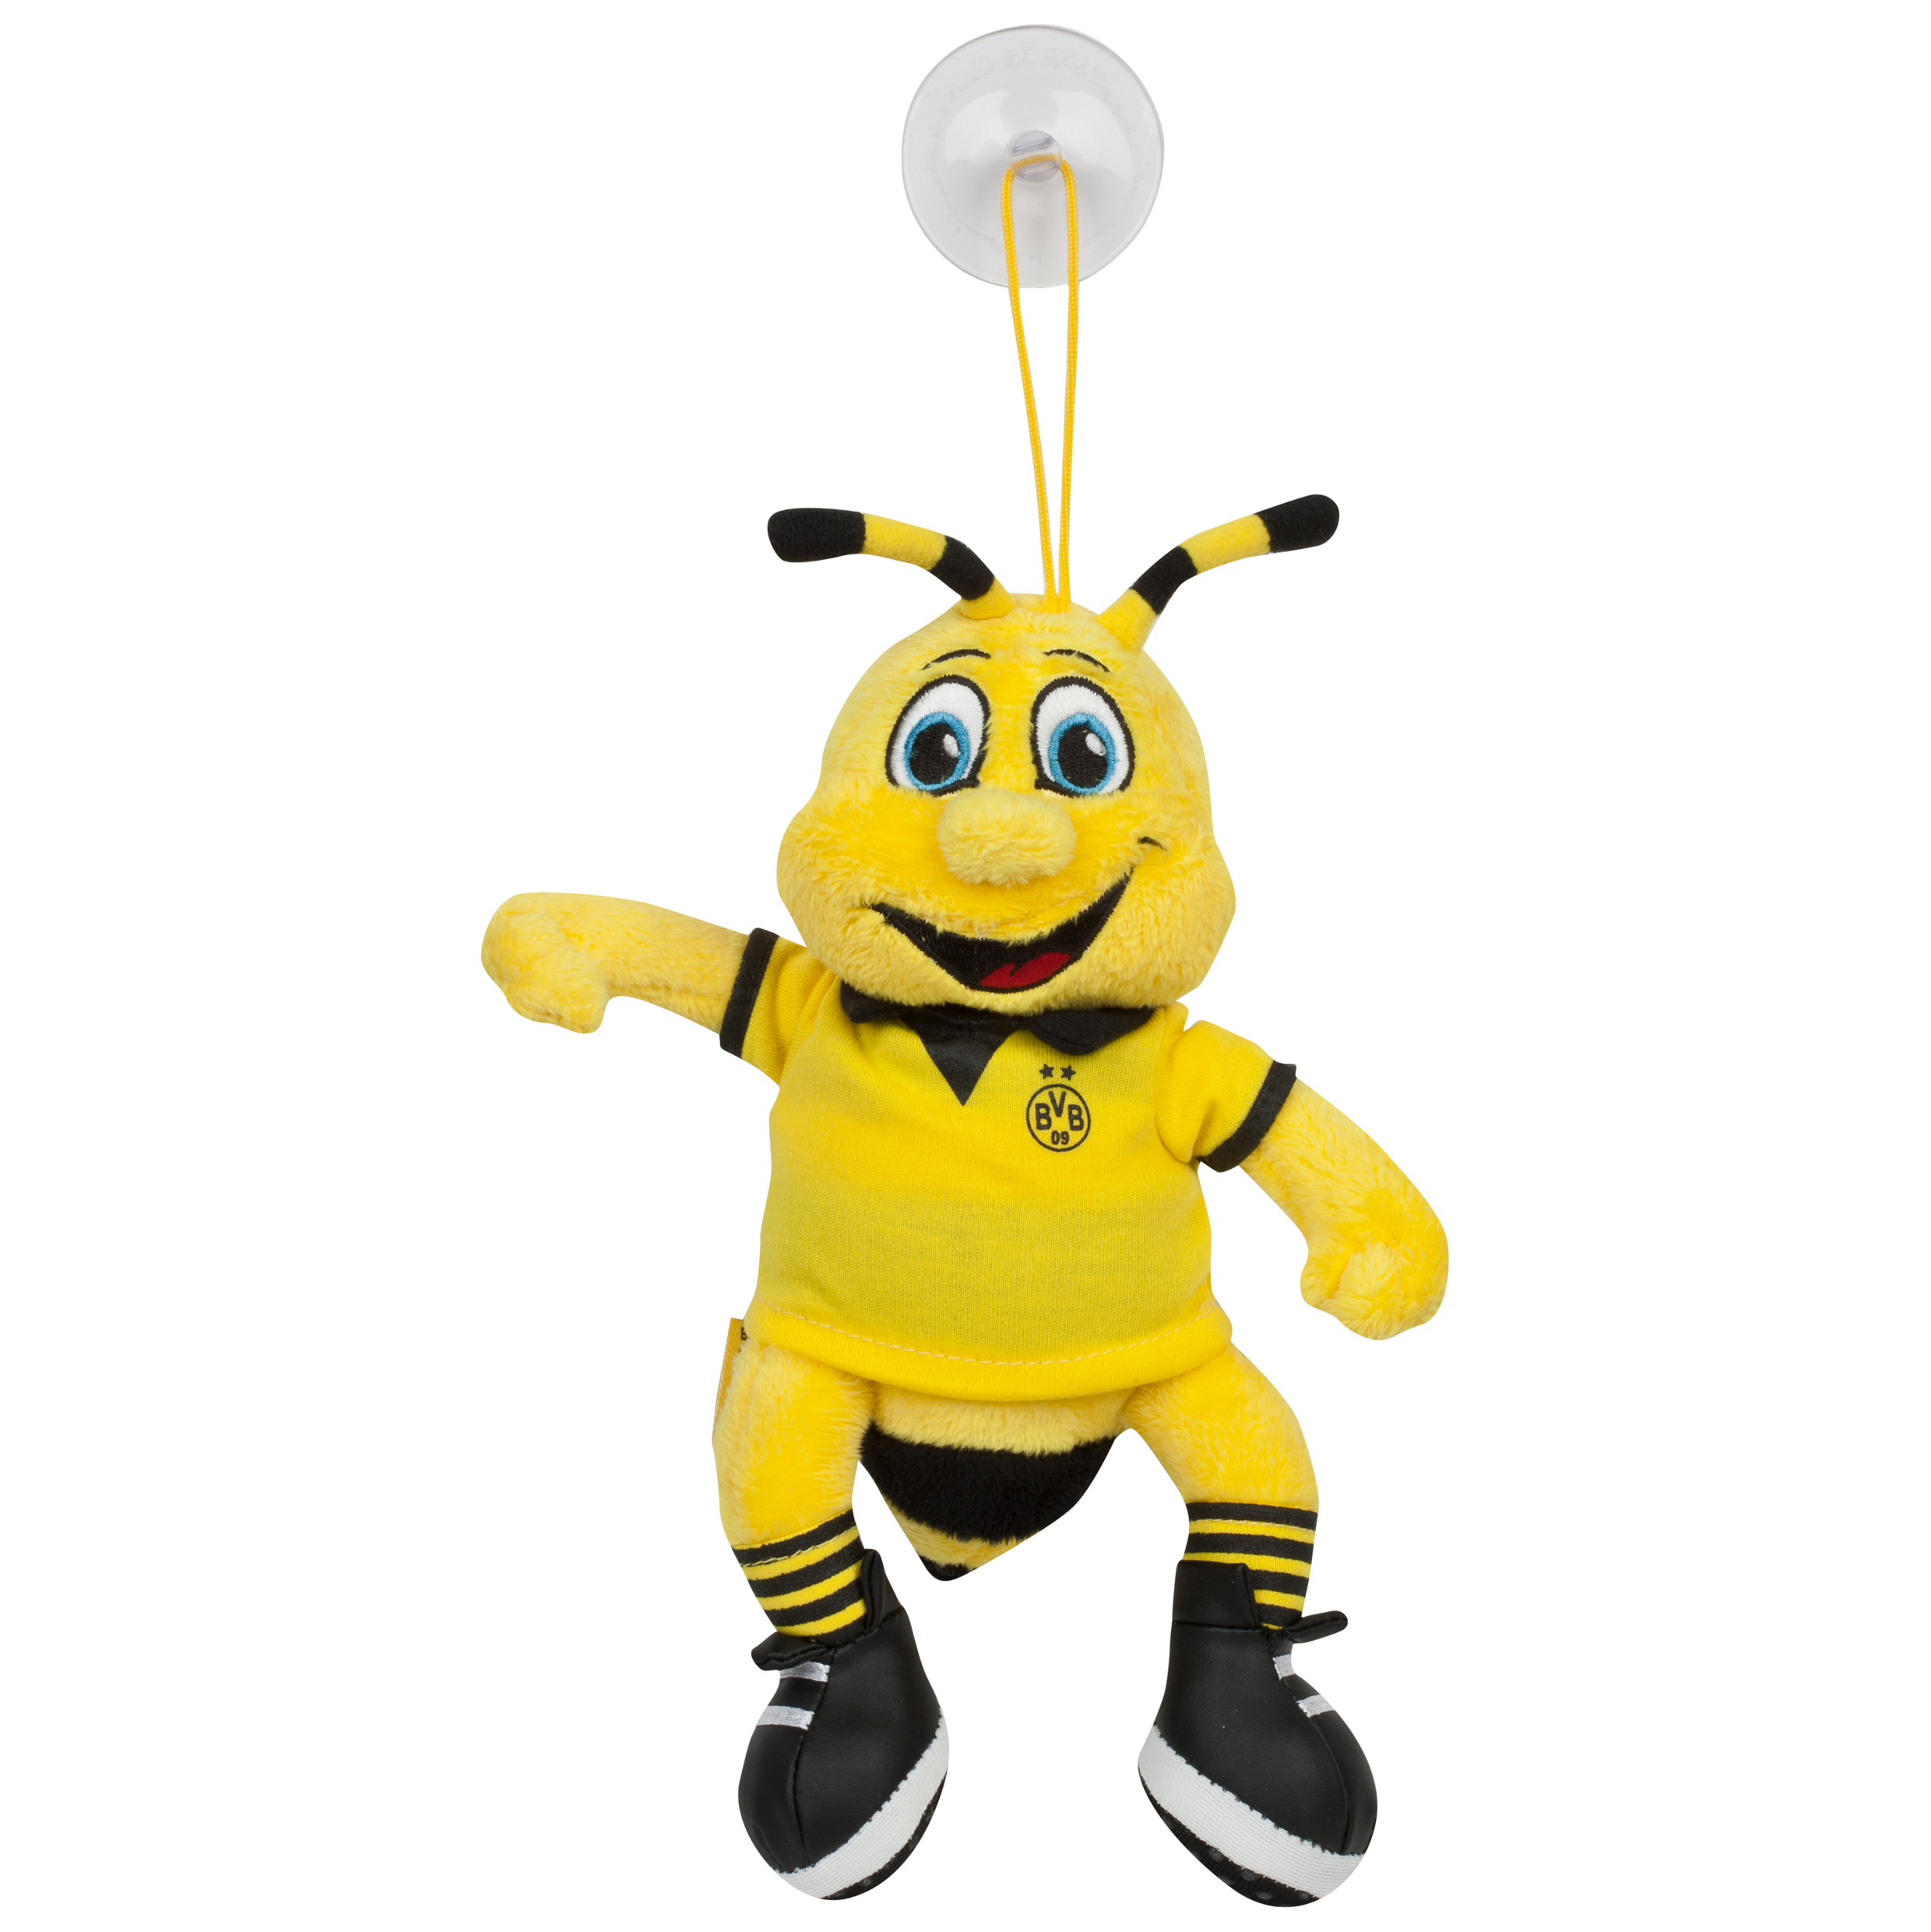 BVB EMMA Mascot Plush with Sucker